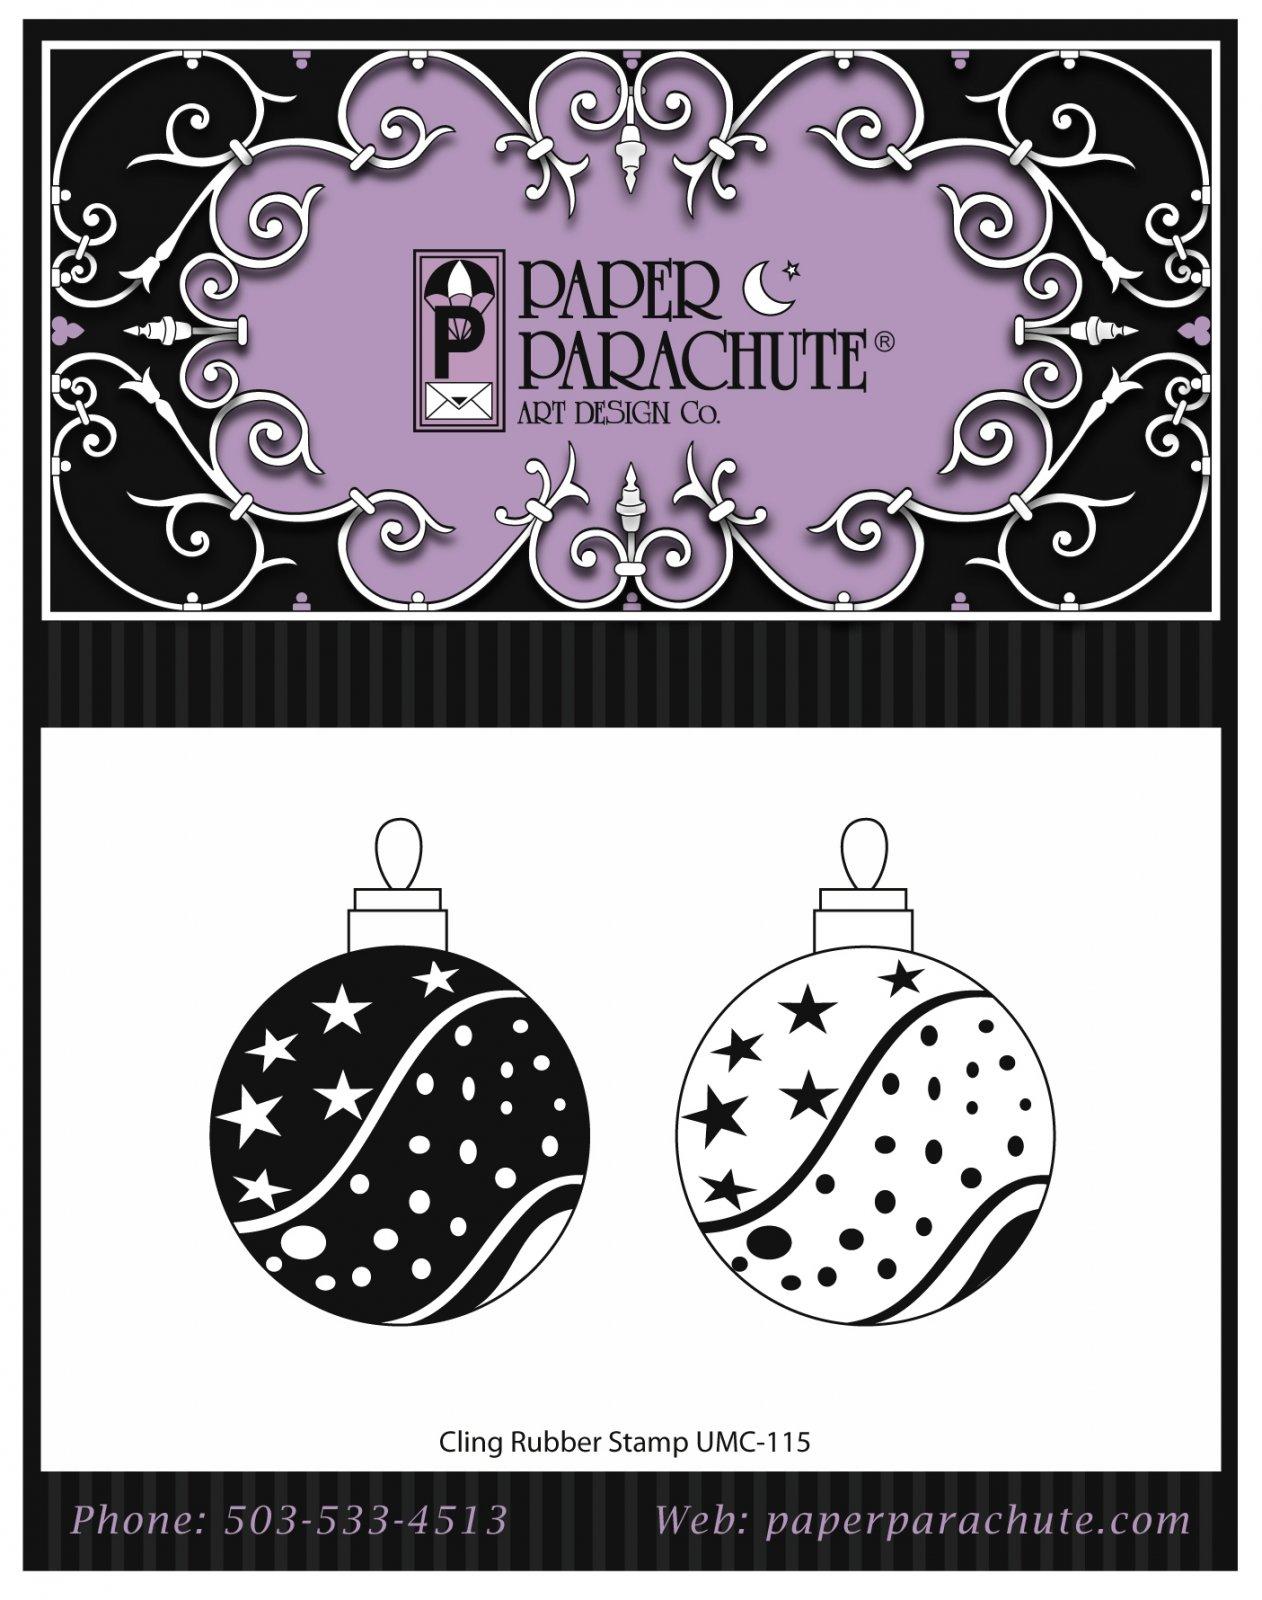 Paper Parachute Rubber Stamp Set - UMC115